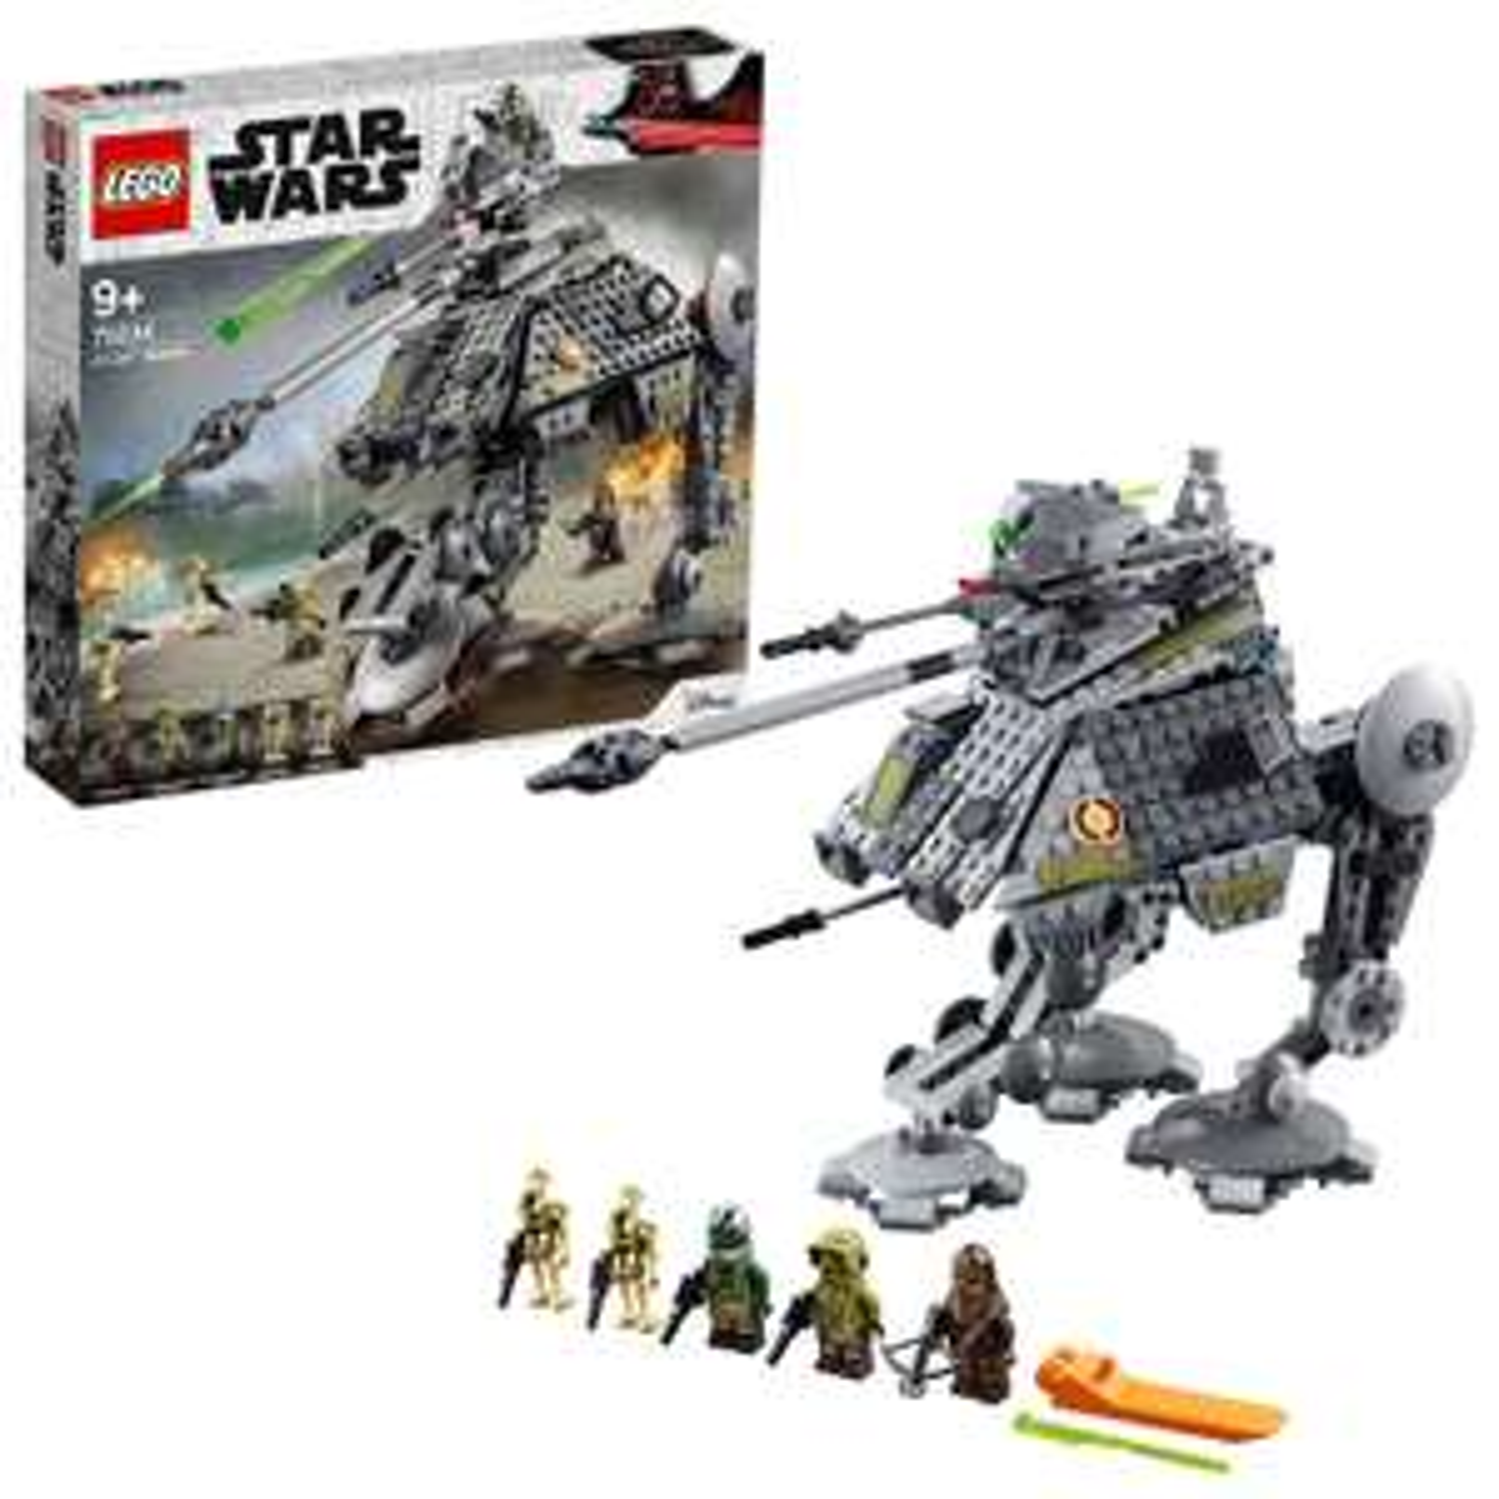 LEGO 75234 Star Wars AT-AP Walker Construction Set £37.39 (£36.04 Using fee free card) @ Amazon France